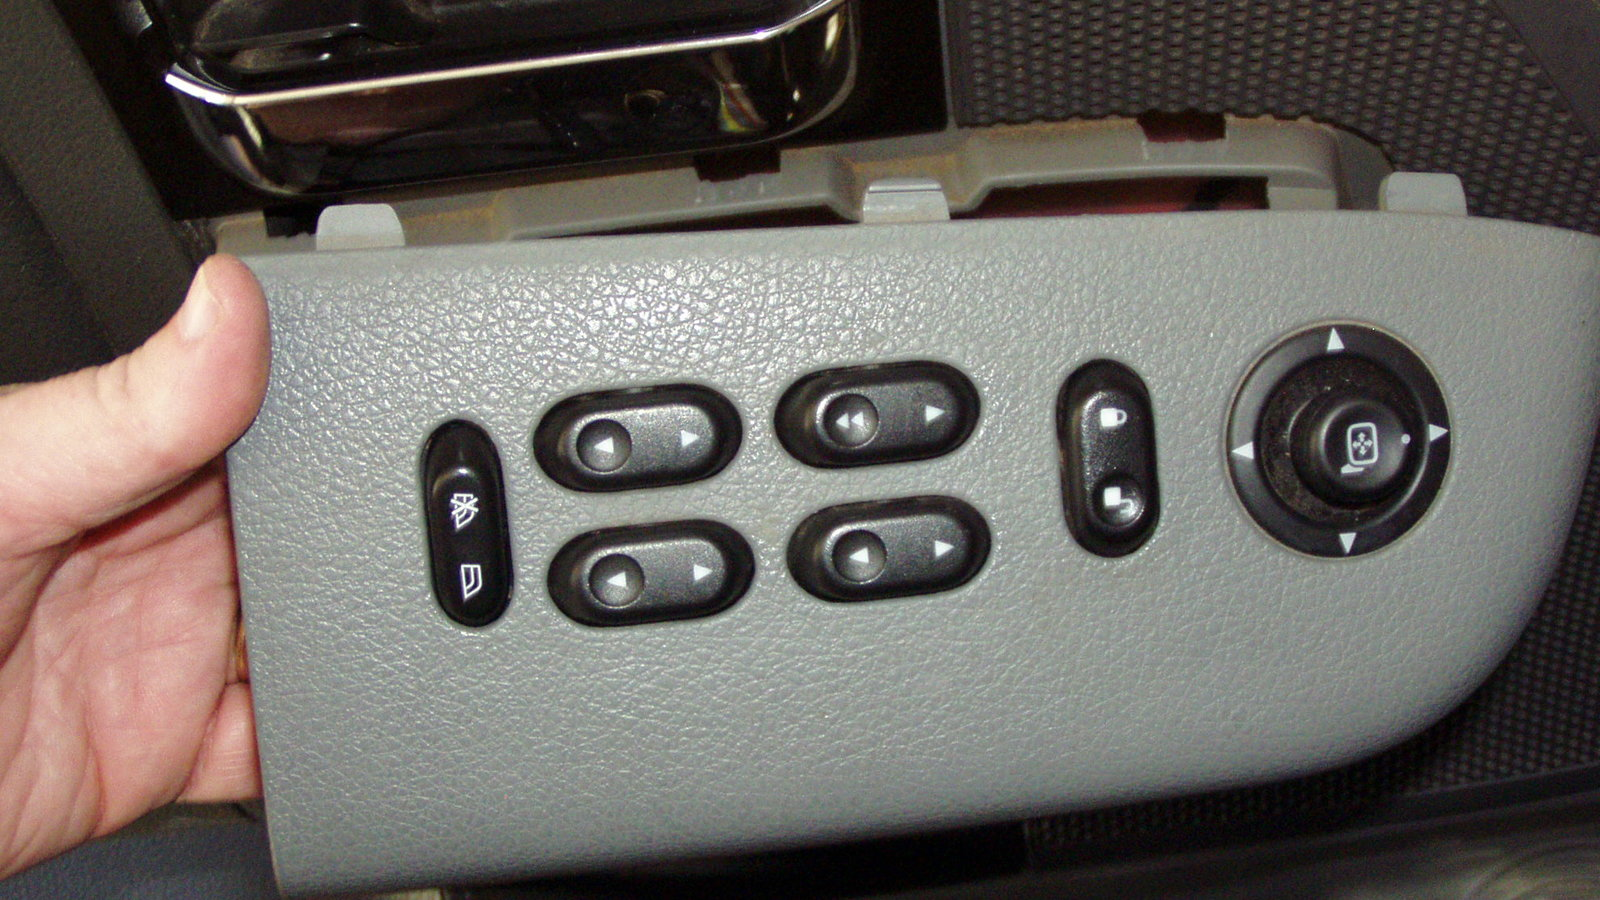 00-02 FORD EXCURSION XLT 6.8L V10 DRIVER LEFT SIDE MASTER POWER WINDOW SWITCH